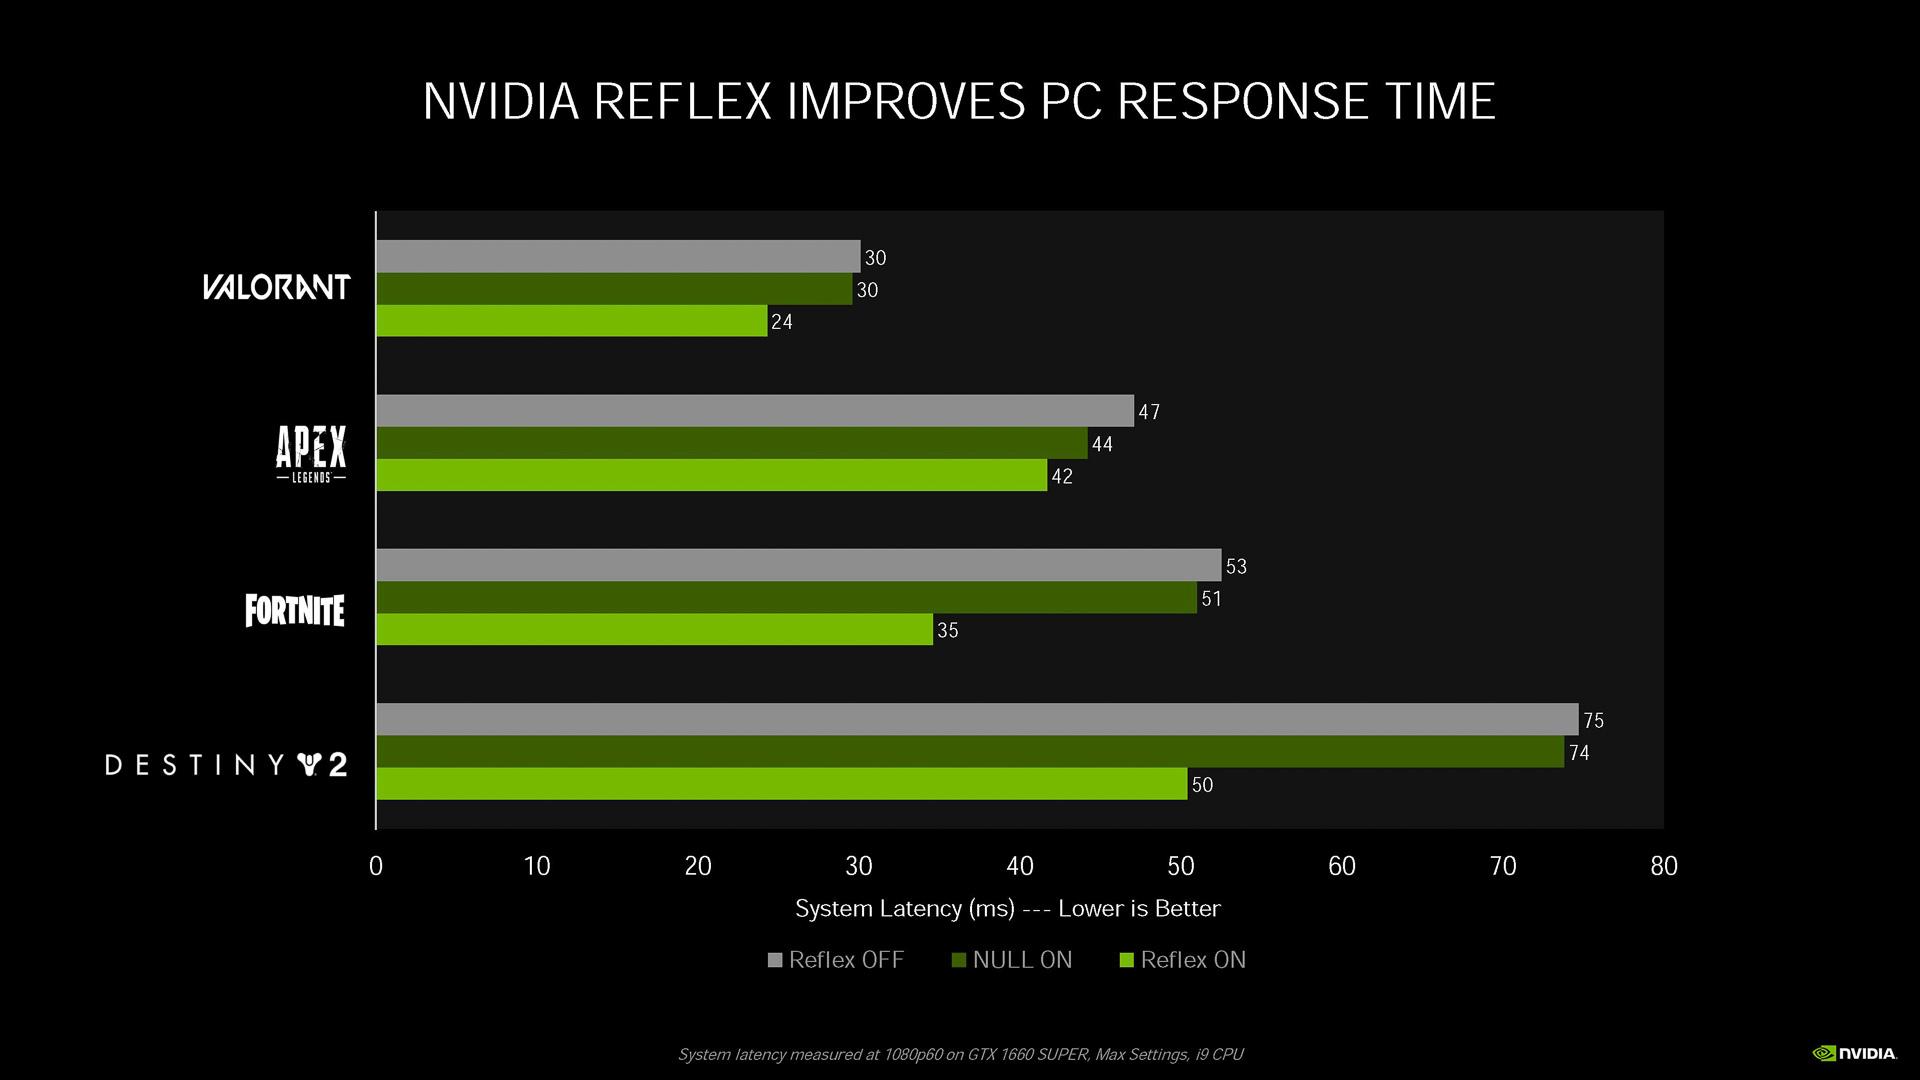 GeForce GTX 1660 SUPER上で、すべてオフ(灰色)、NVIDIA Ultra Low Latency(NULL、が濃い緑)、Reflexオン(薄い緑)を比較しているところ。Reflexオンがレイテンシを大きく削減できていることがわかる